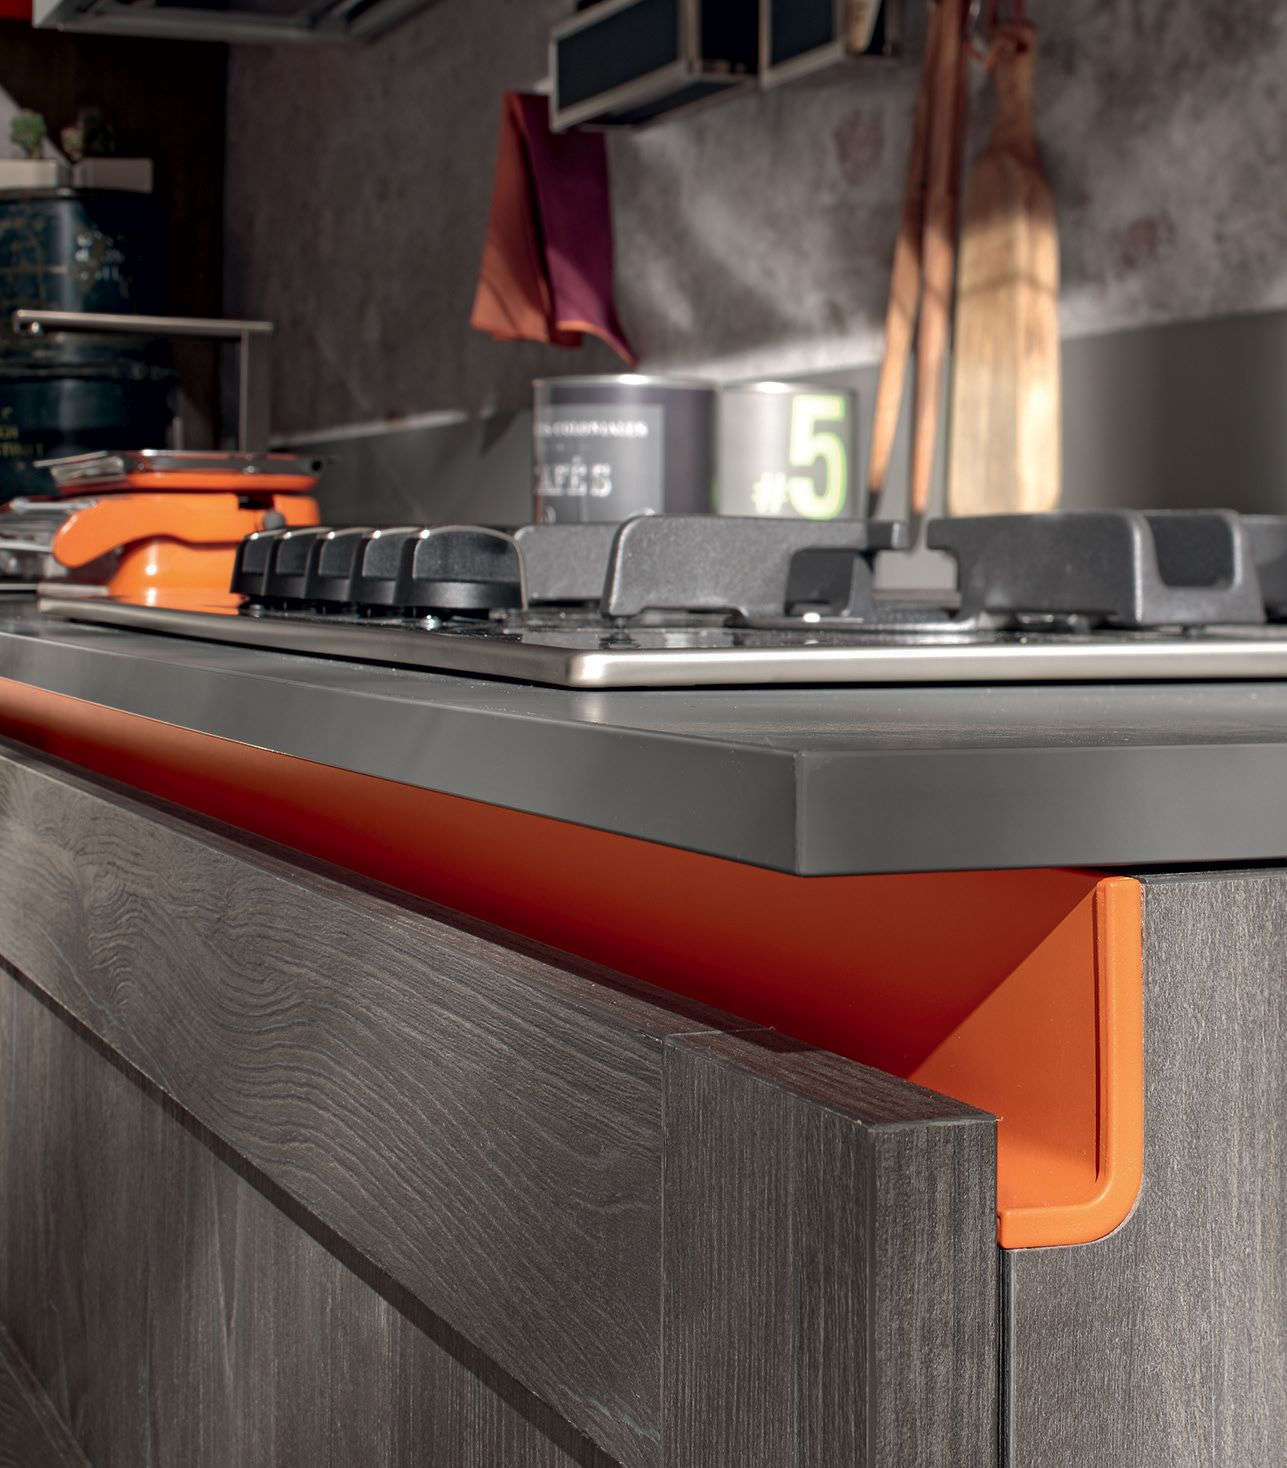 Stosa Cucine arredamento per modelli di cucine moderne City  Arredamento  Modern kitchen